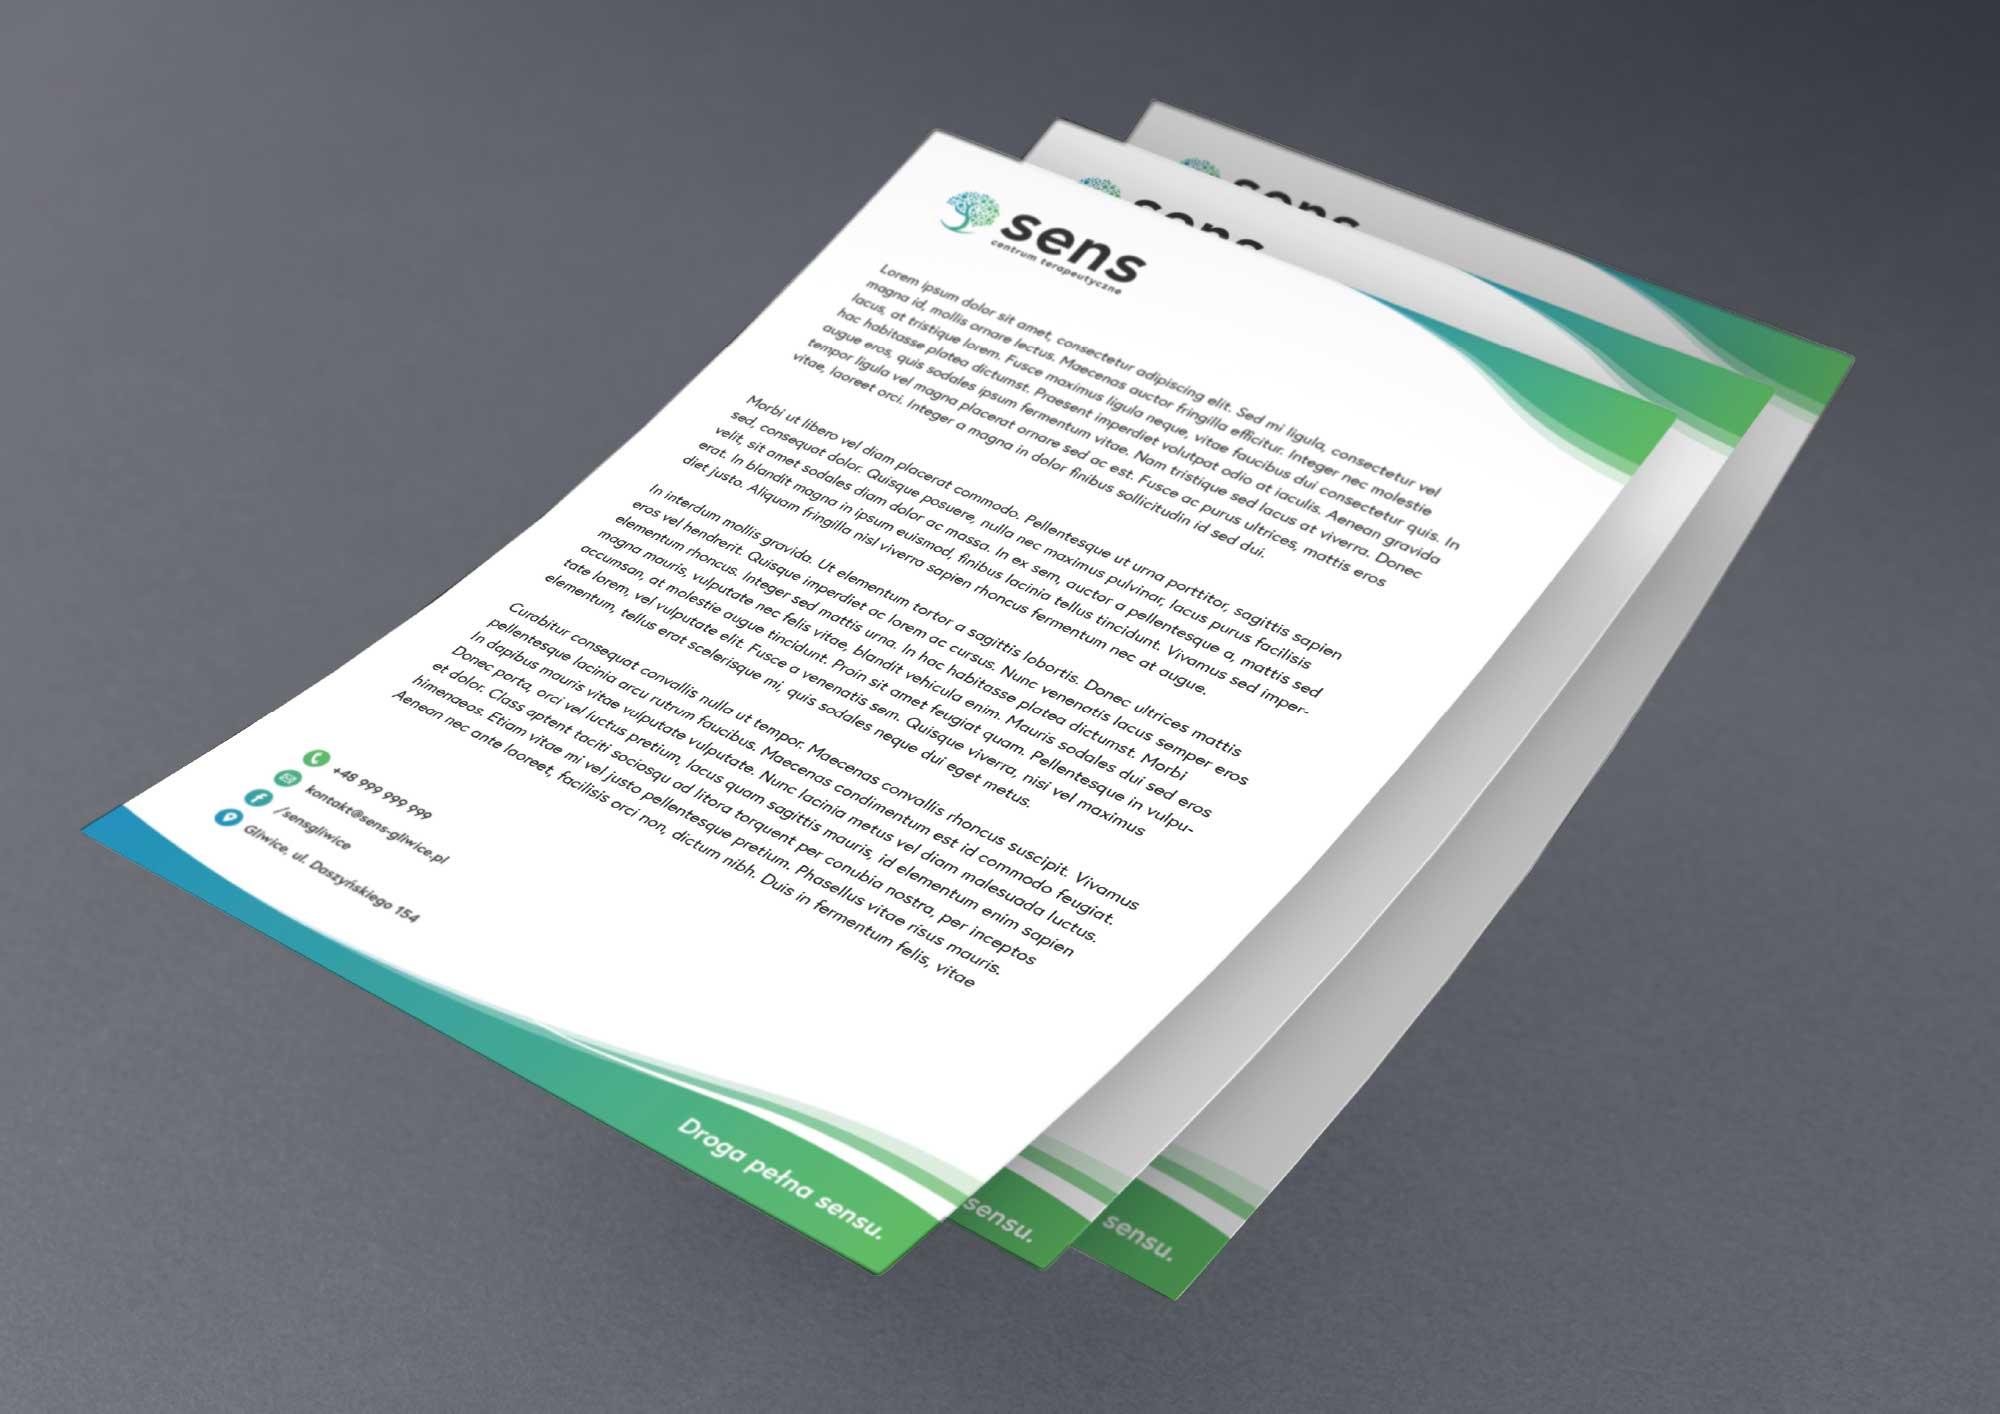 Papier firmowy - Sens